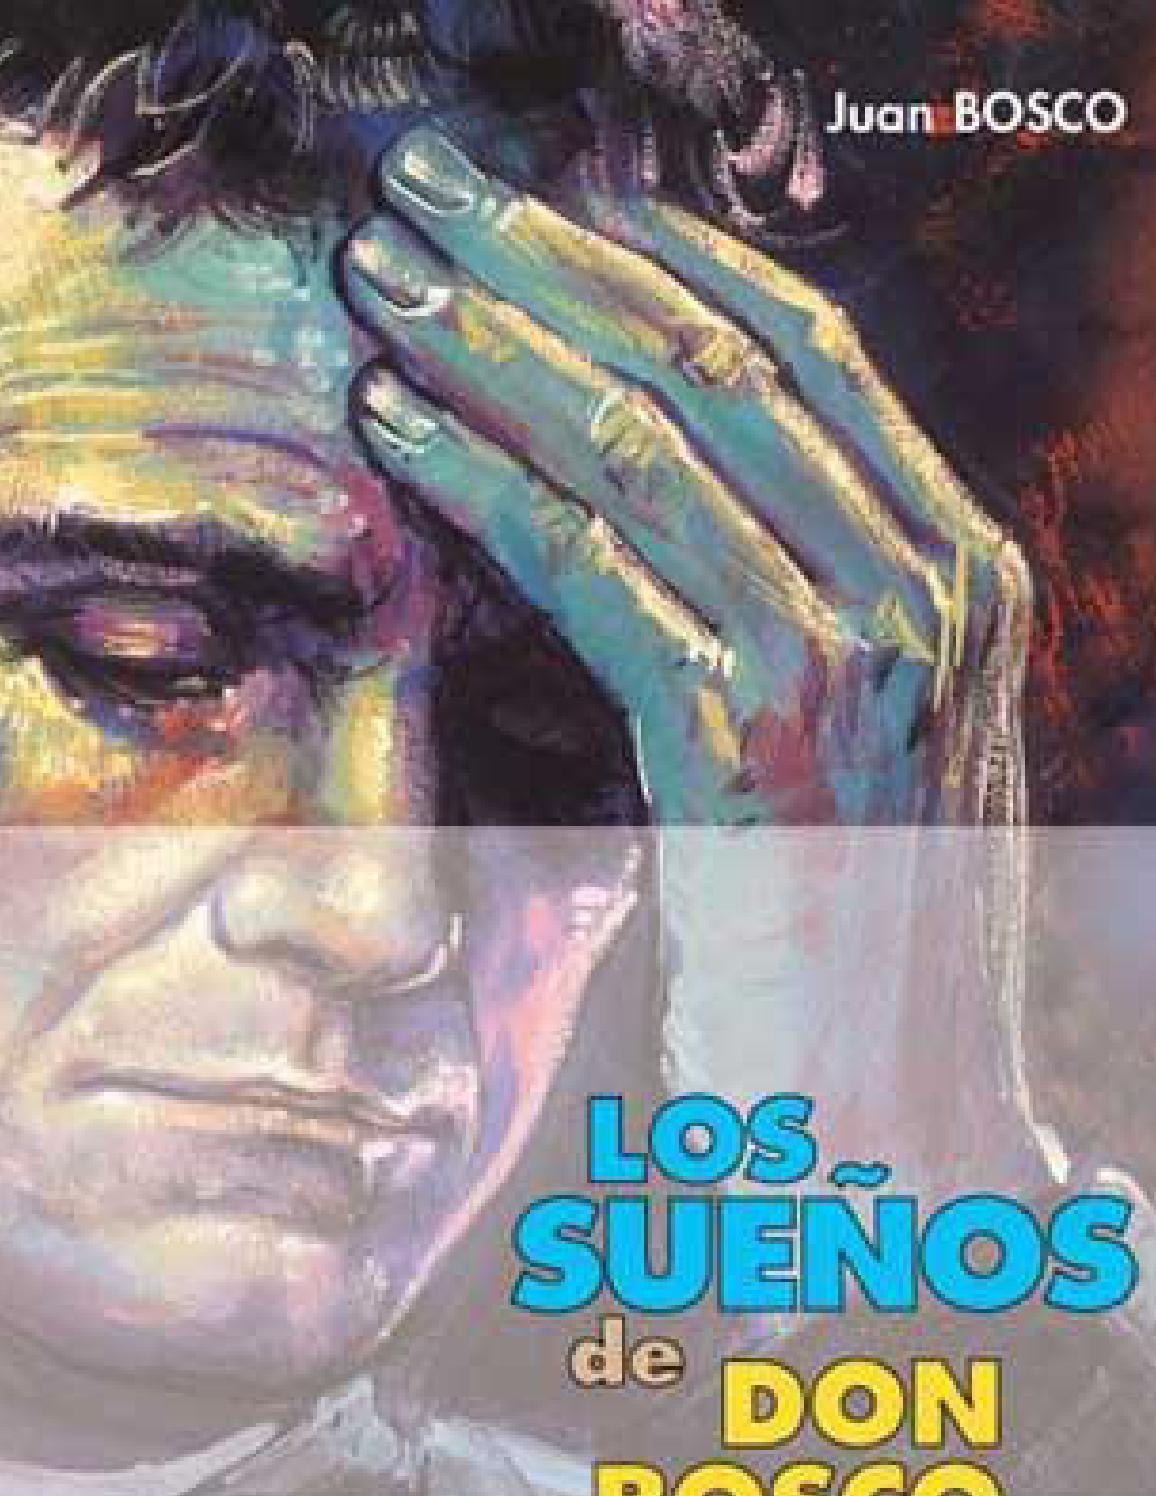 Sueños de don bosco by Dr.AlfaroKelvin - issuu ba8a89c339a